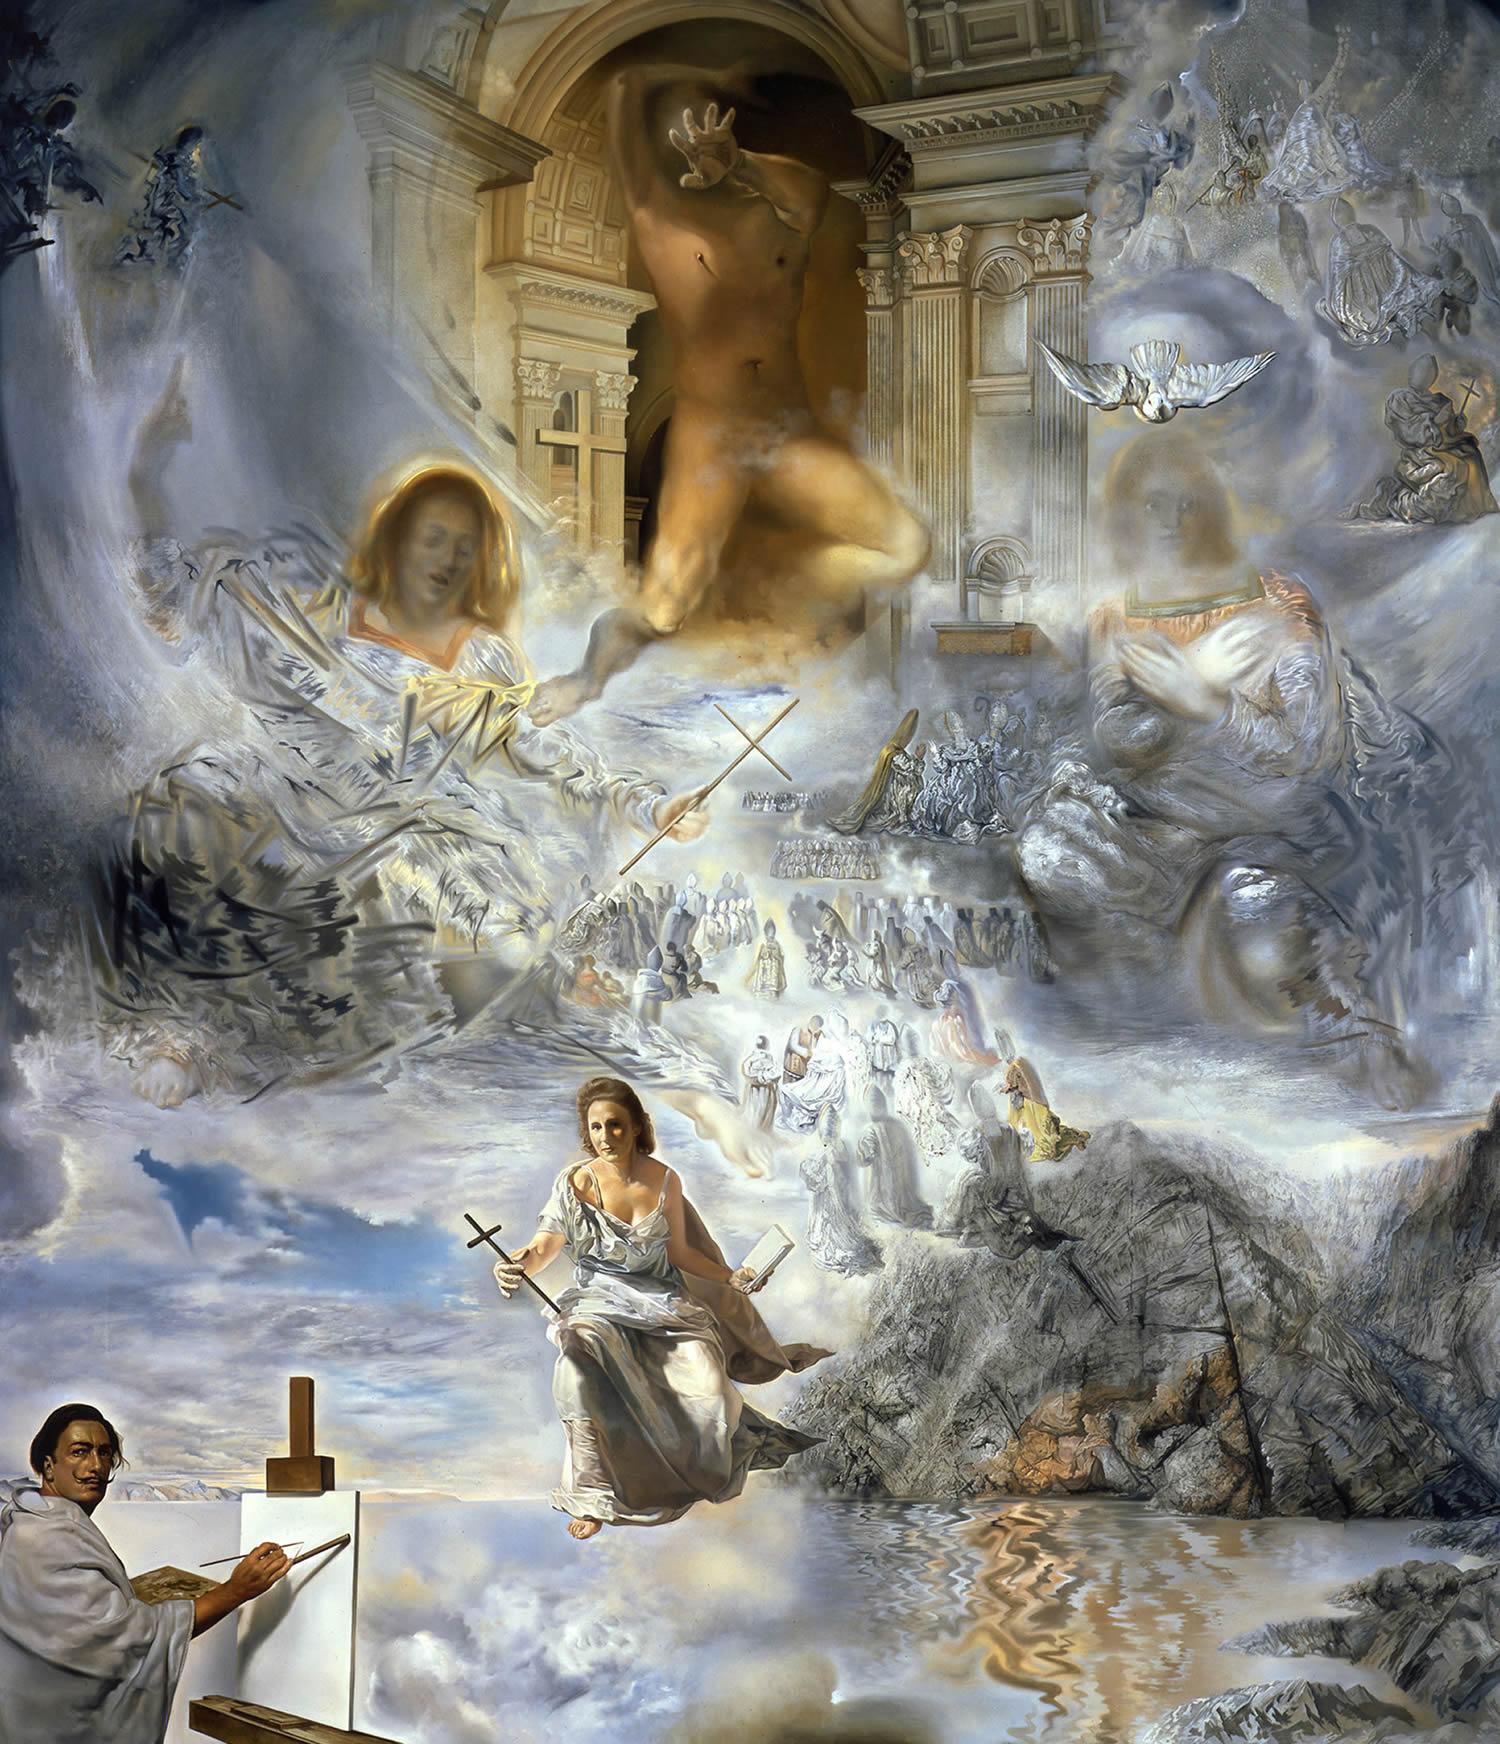 Salvador Dalí - The Ecumenical Council, 1960 | Trivium Art History